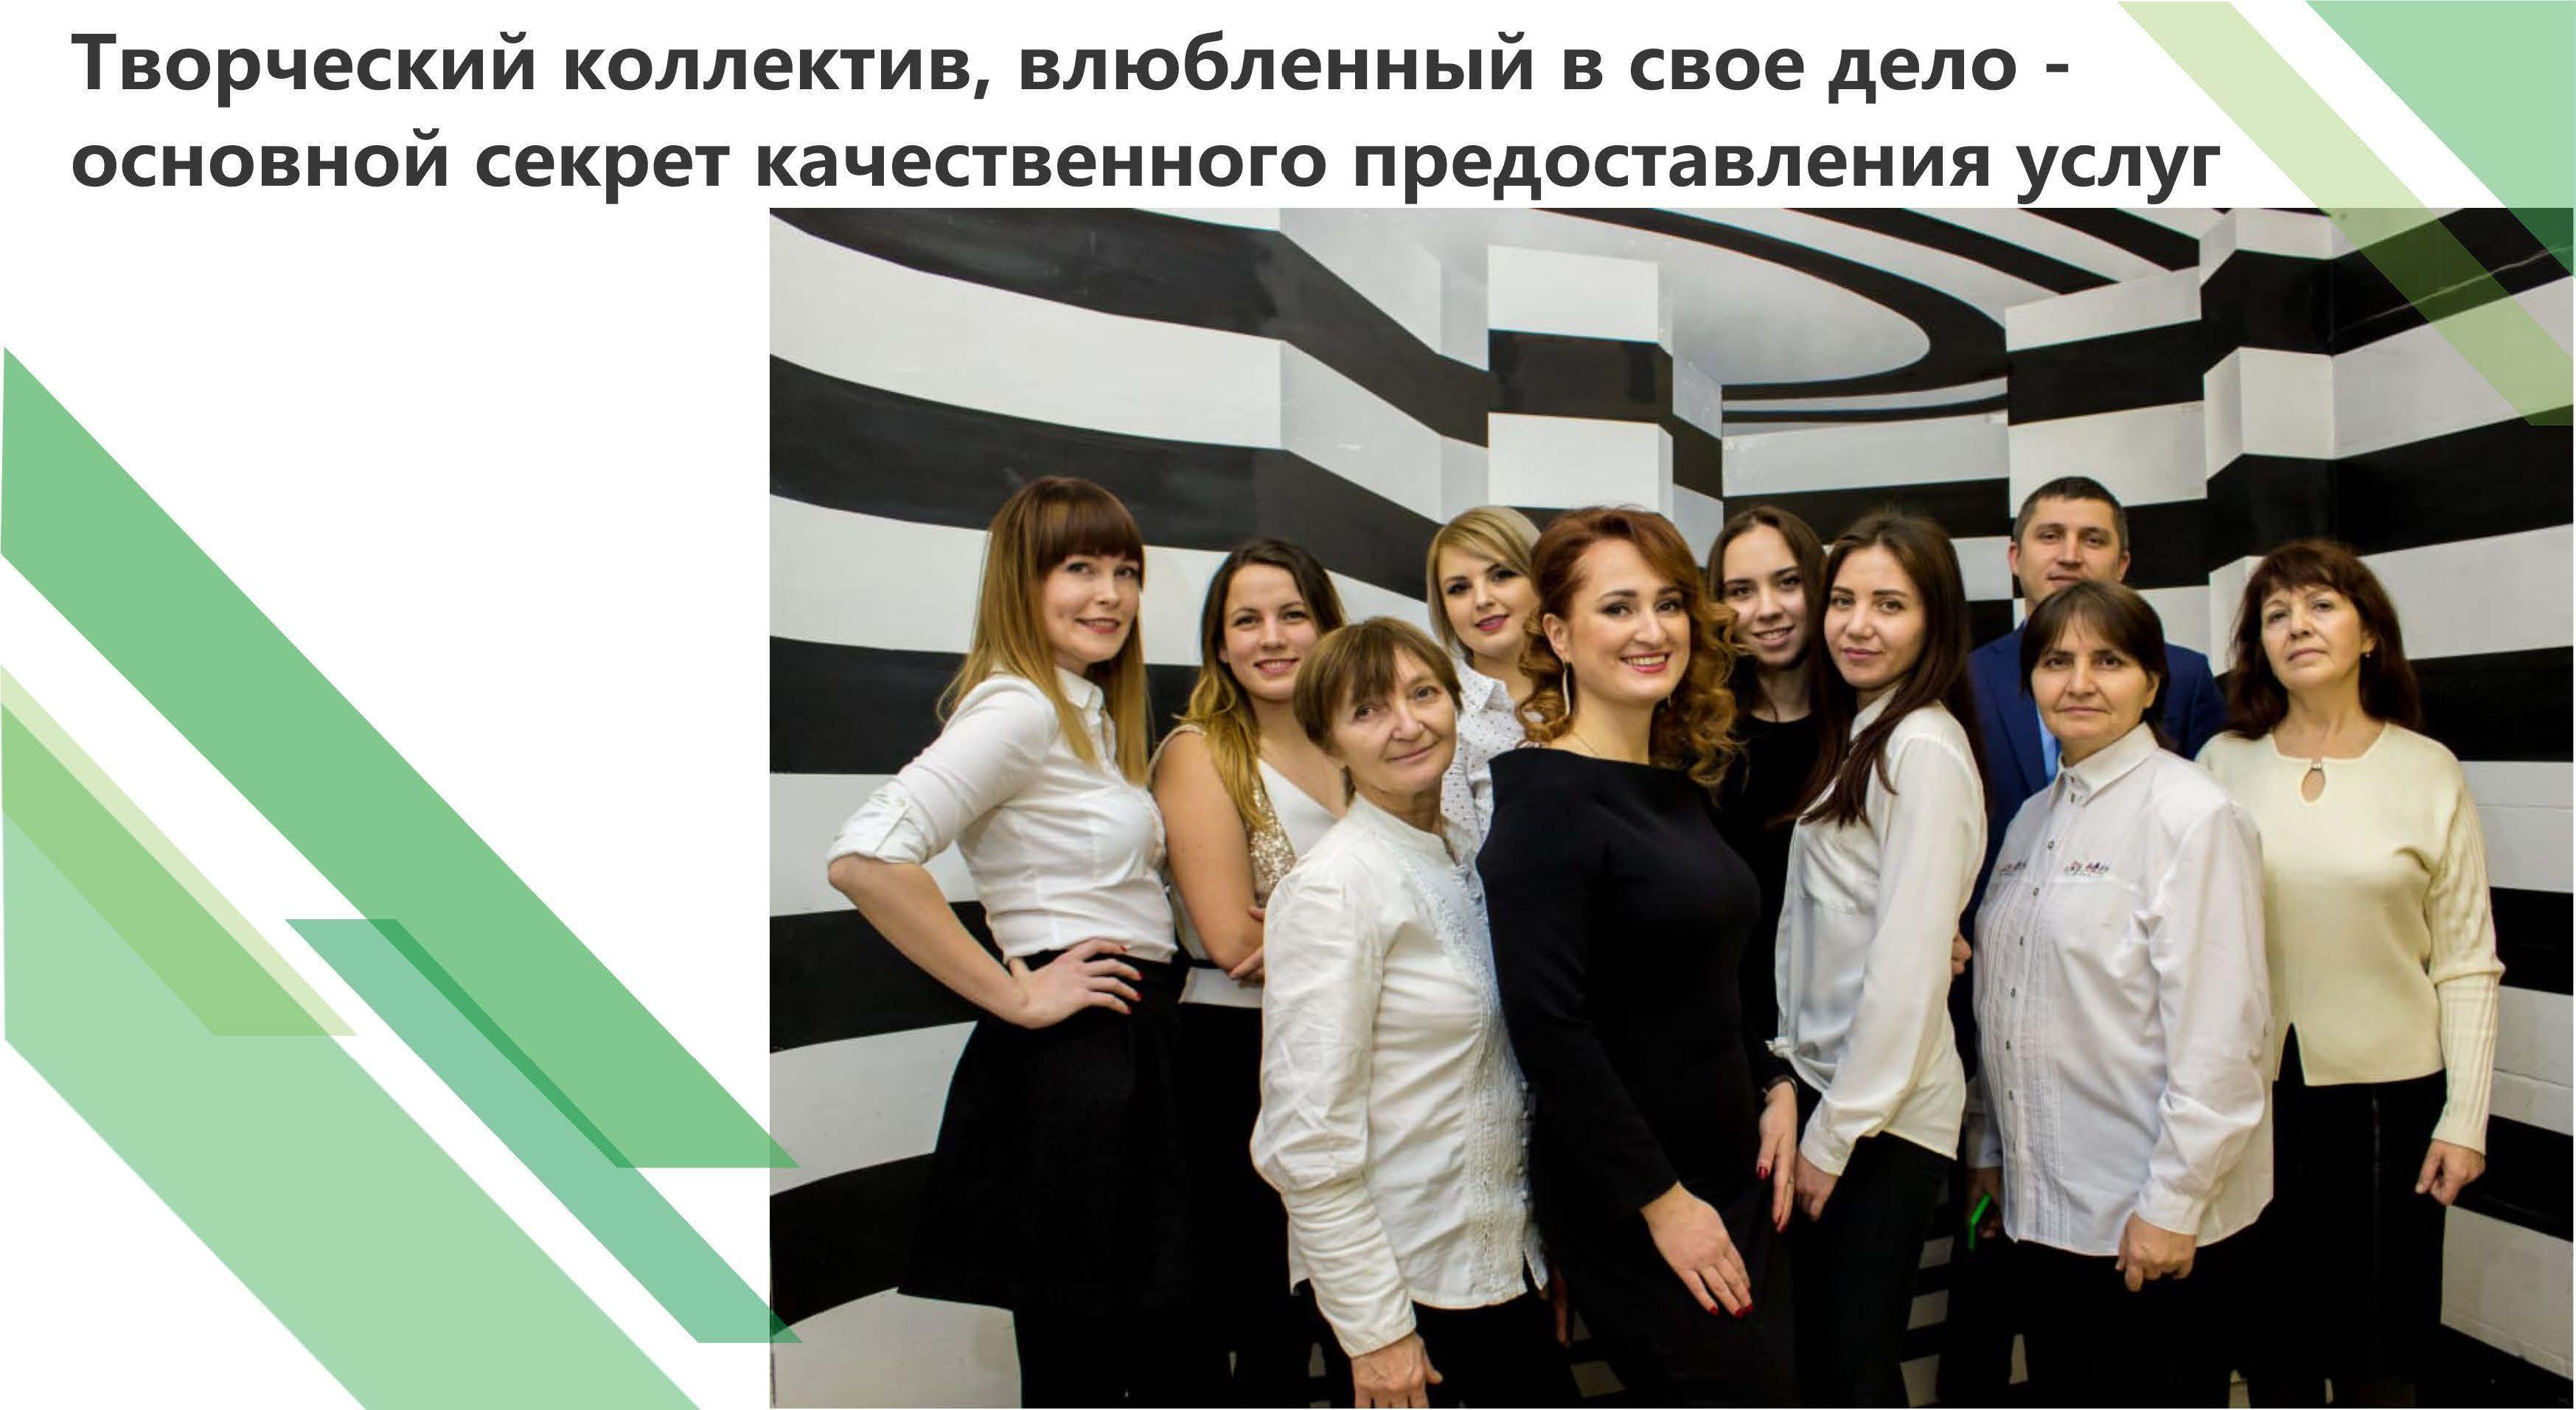 kp_ko_Страница_03